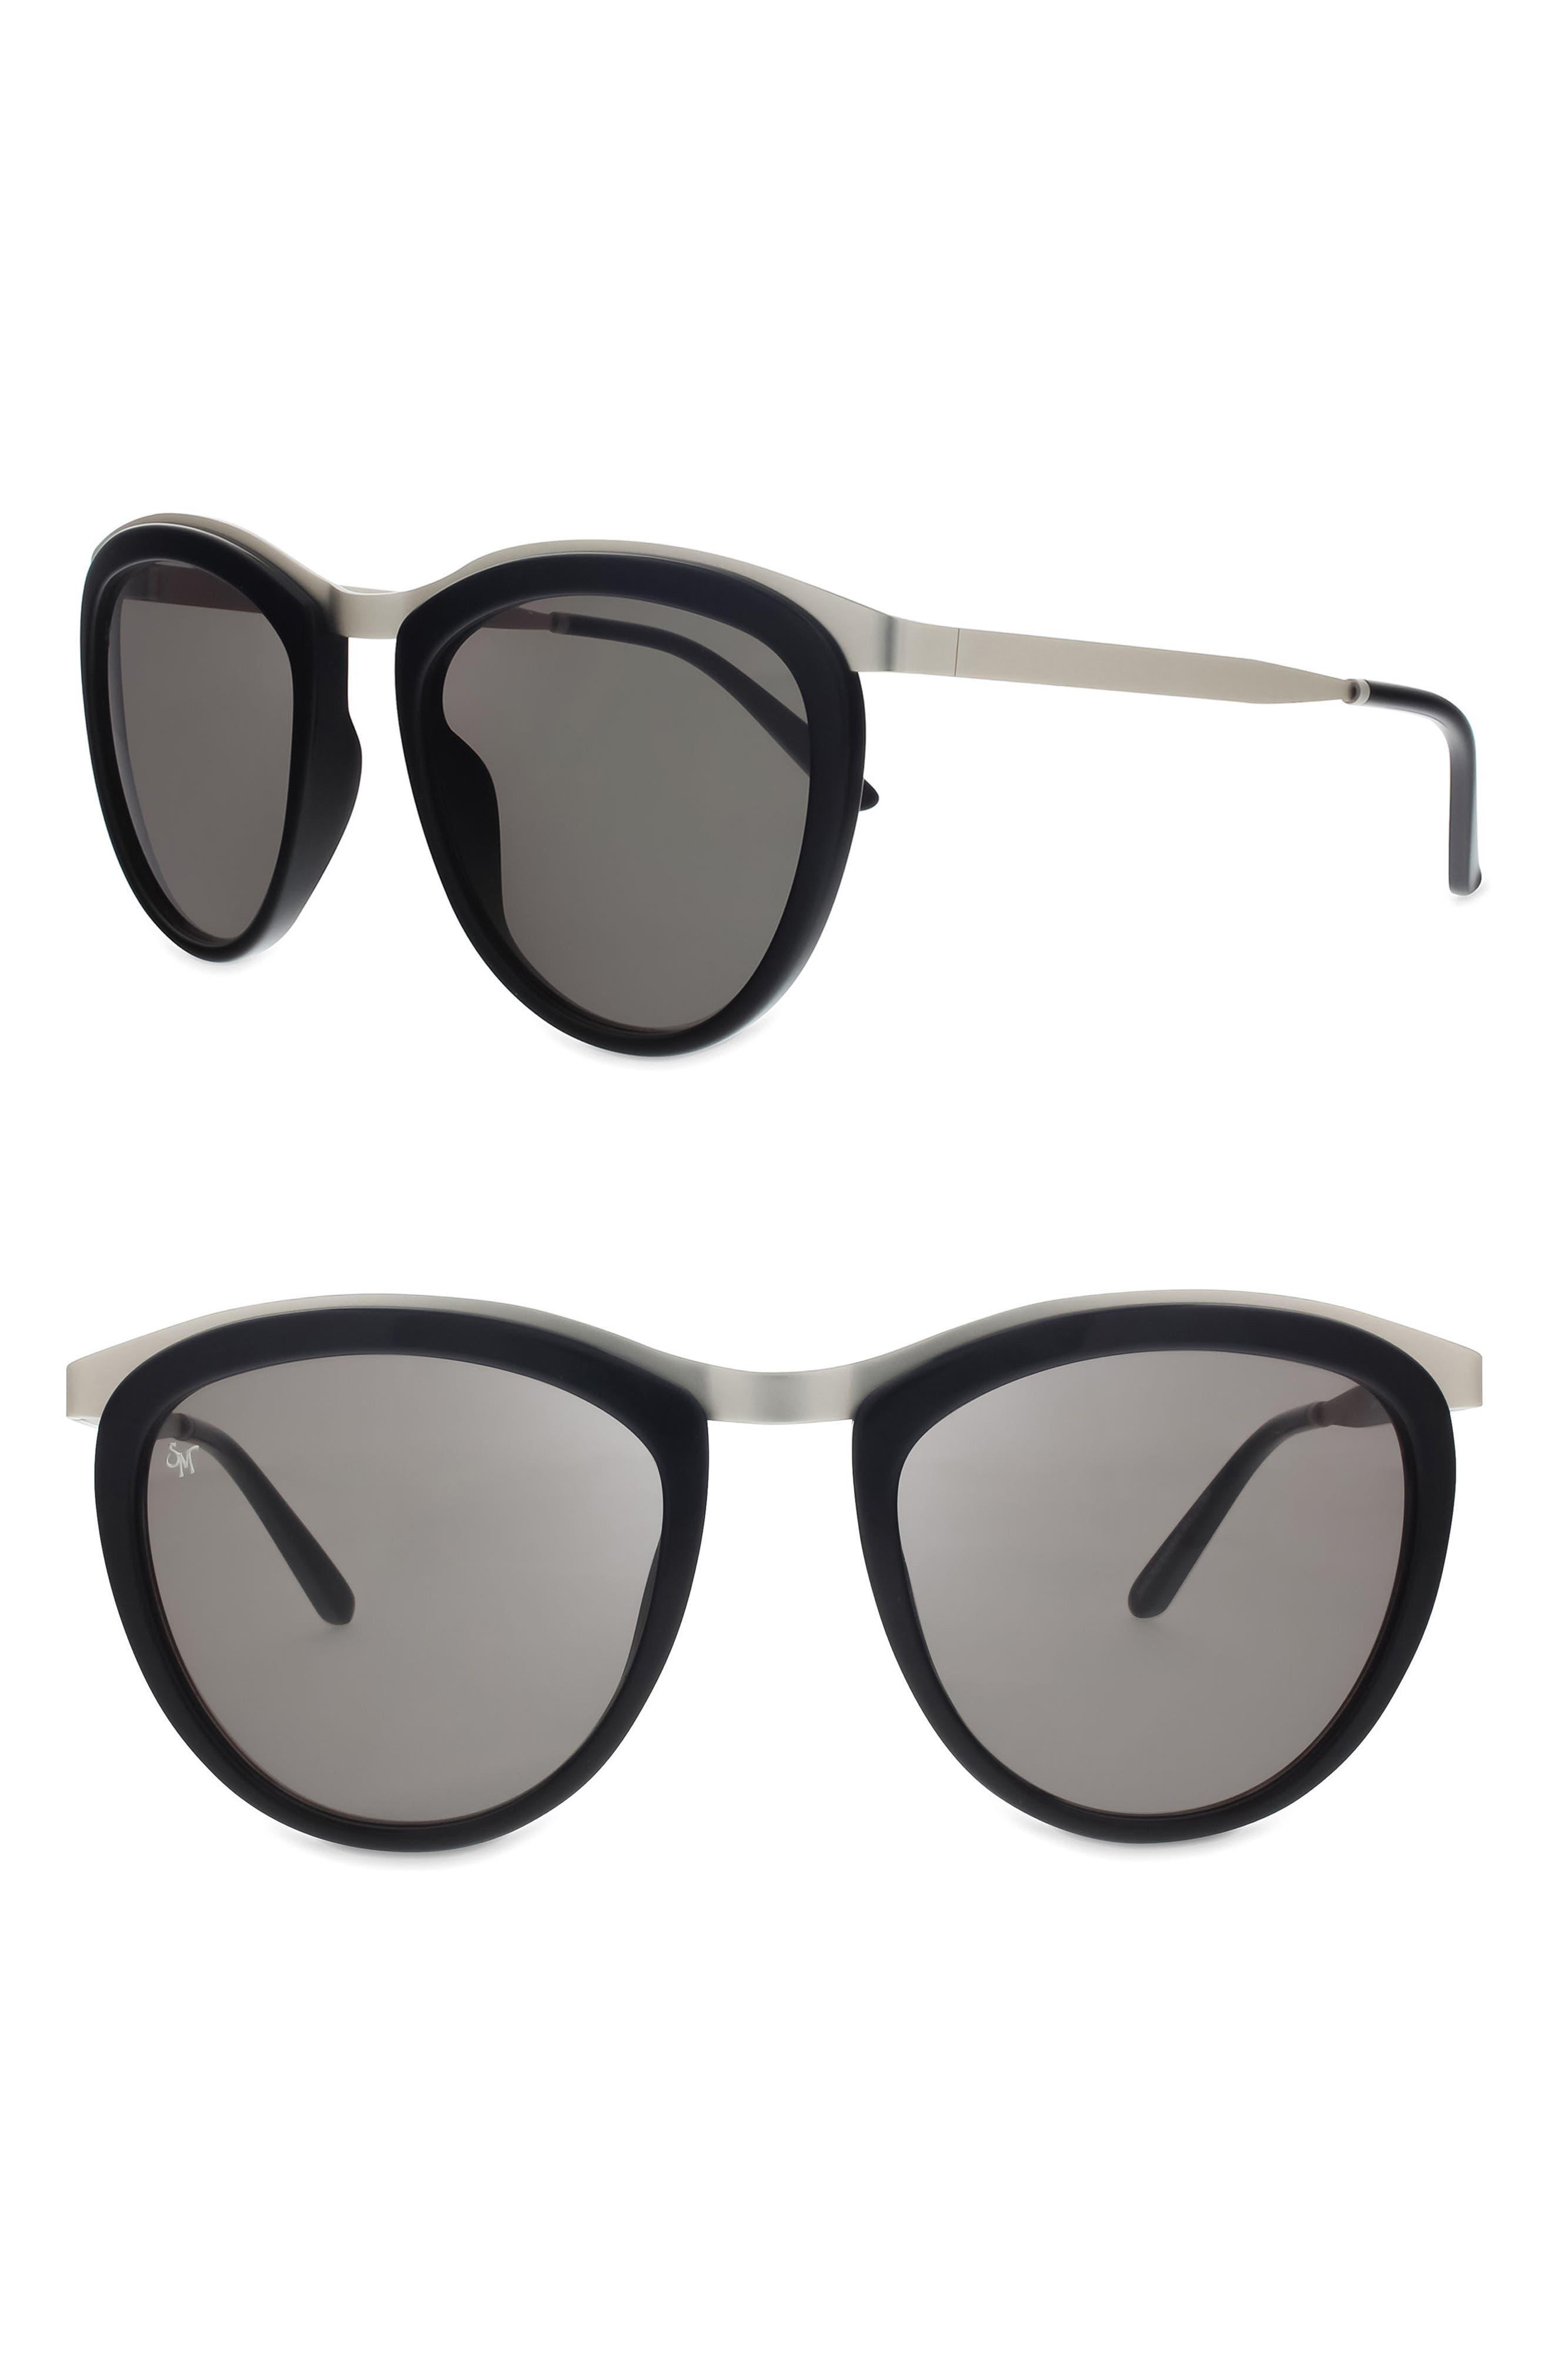 Comic Strip 51mm Round Sunglasses,                             Main thumbnail 1, color,                             BLACK/ MATTE SILVER